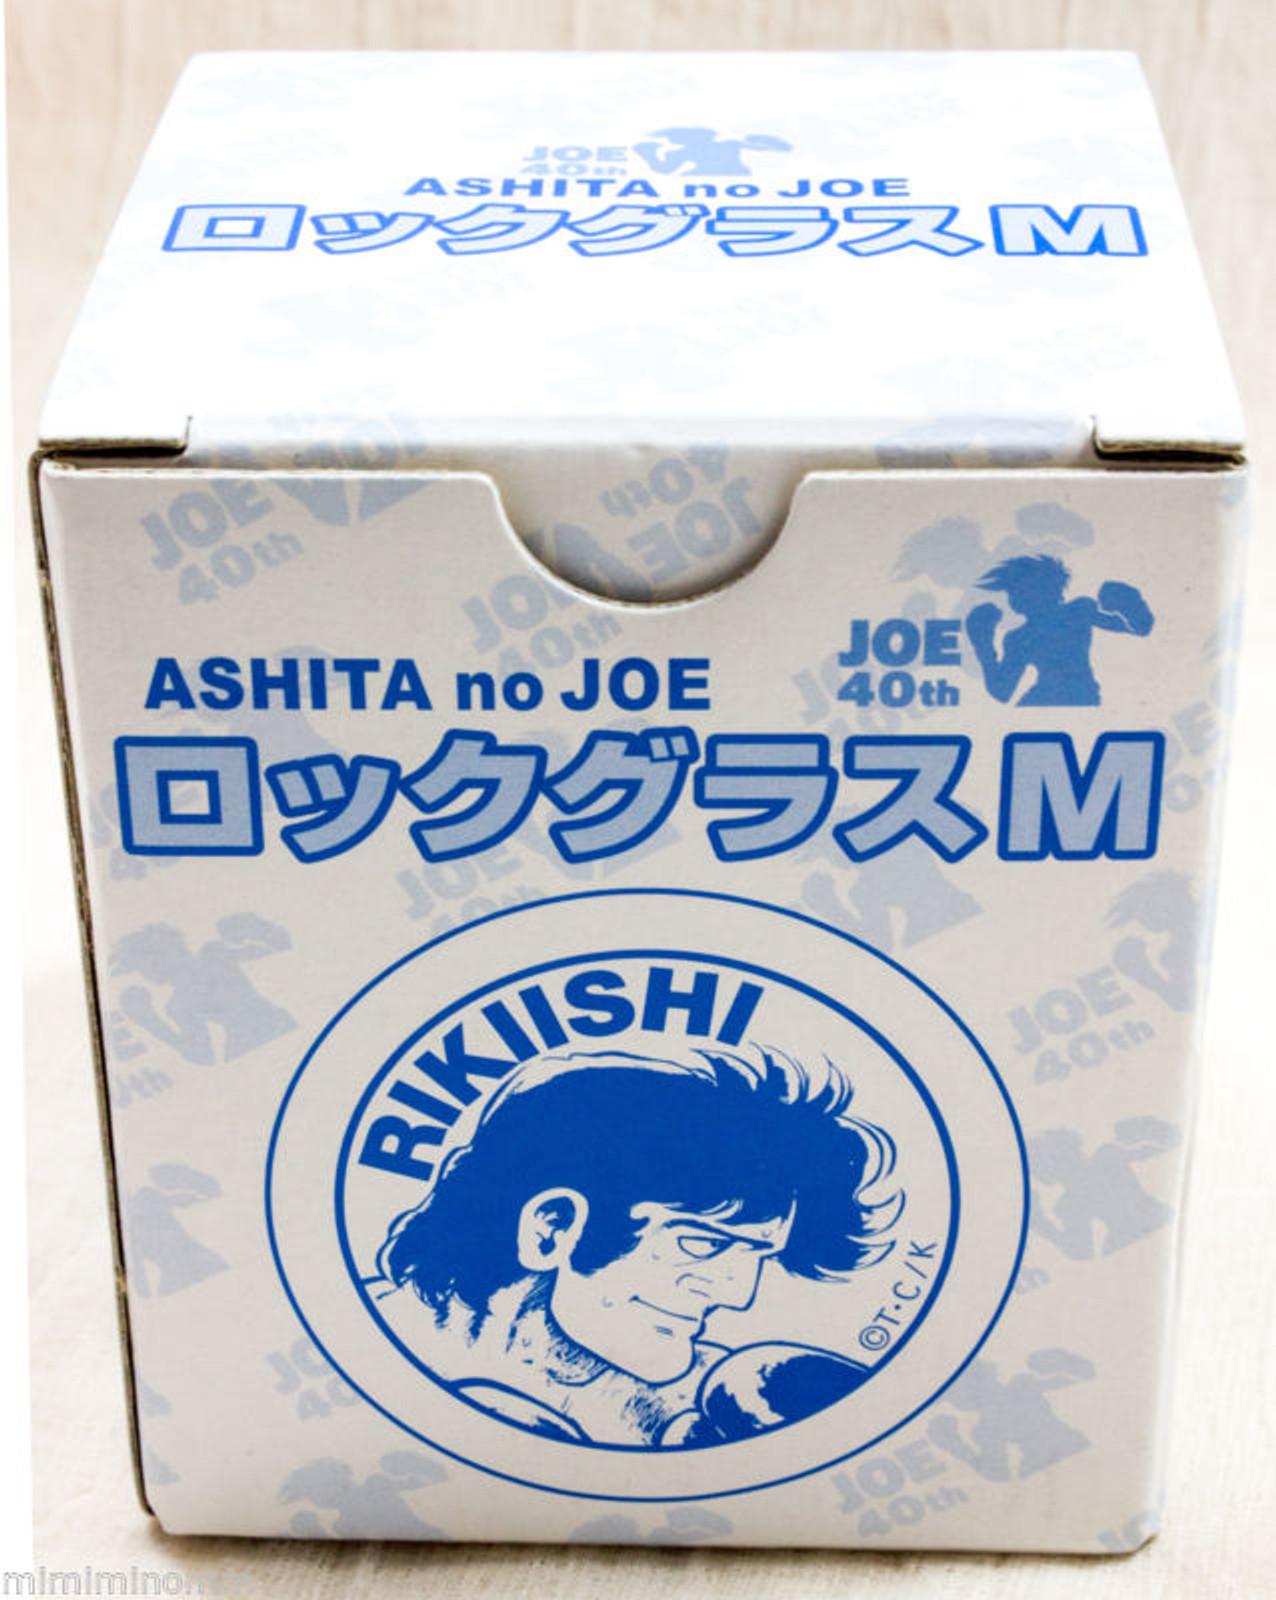 Ashita no Joe RIKIISHI Rocks Glass JOE 40th Anniversary JAPAN ANIME MANGA